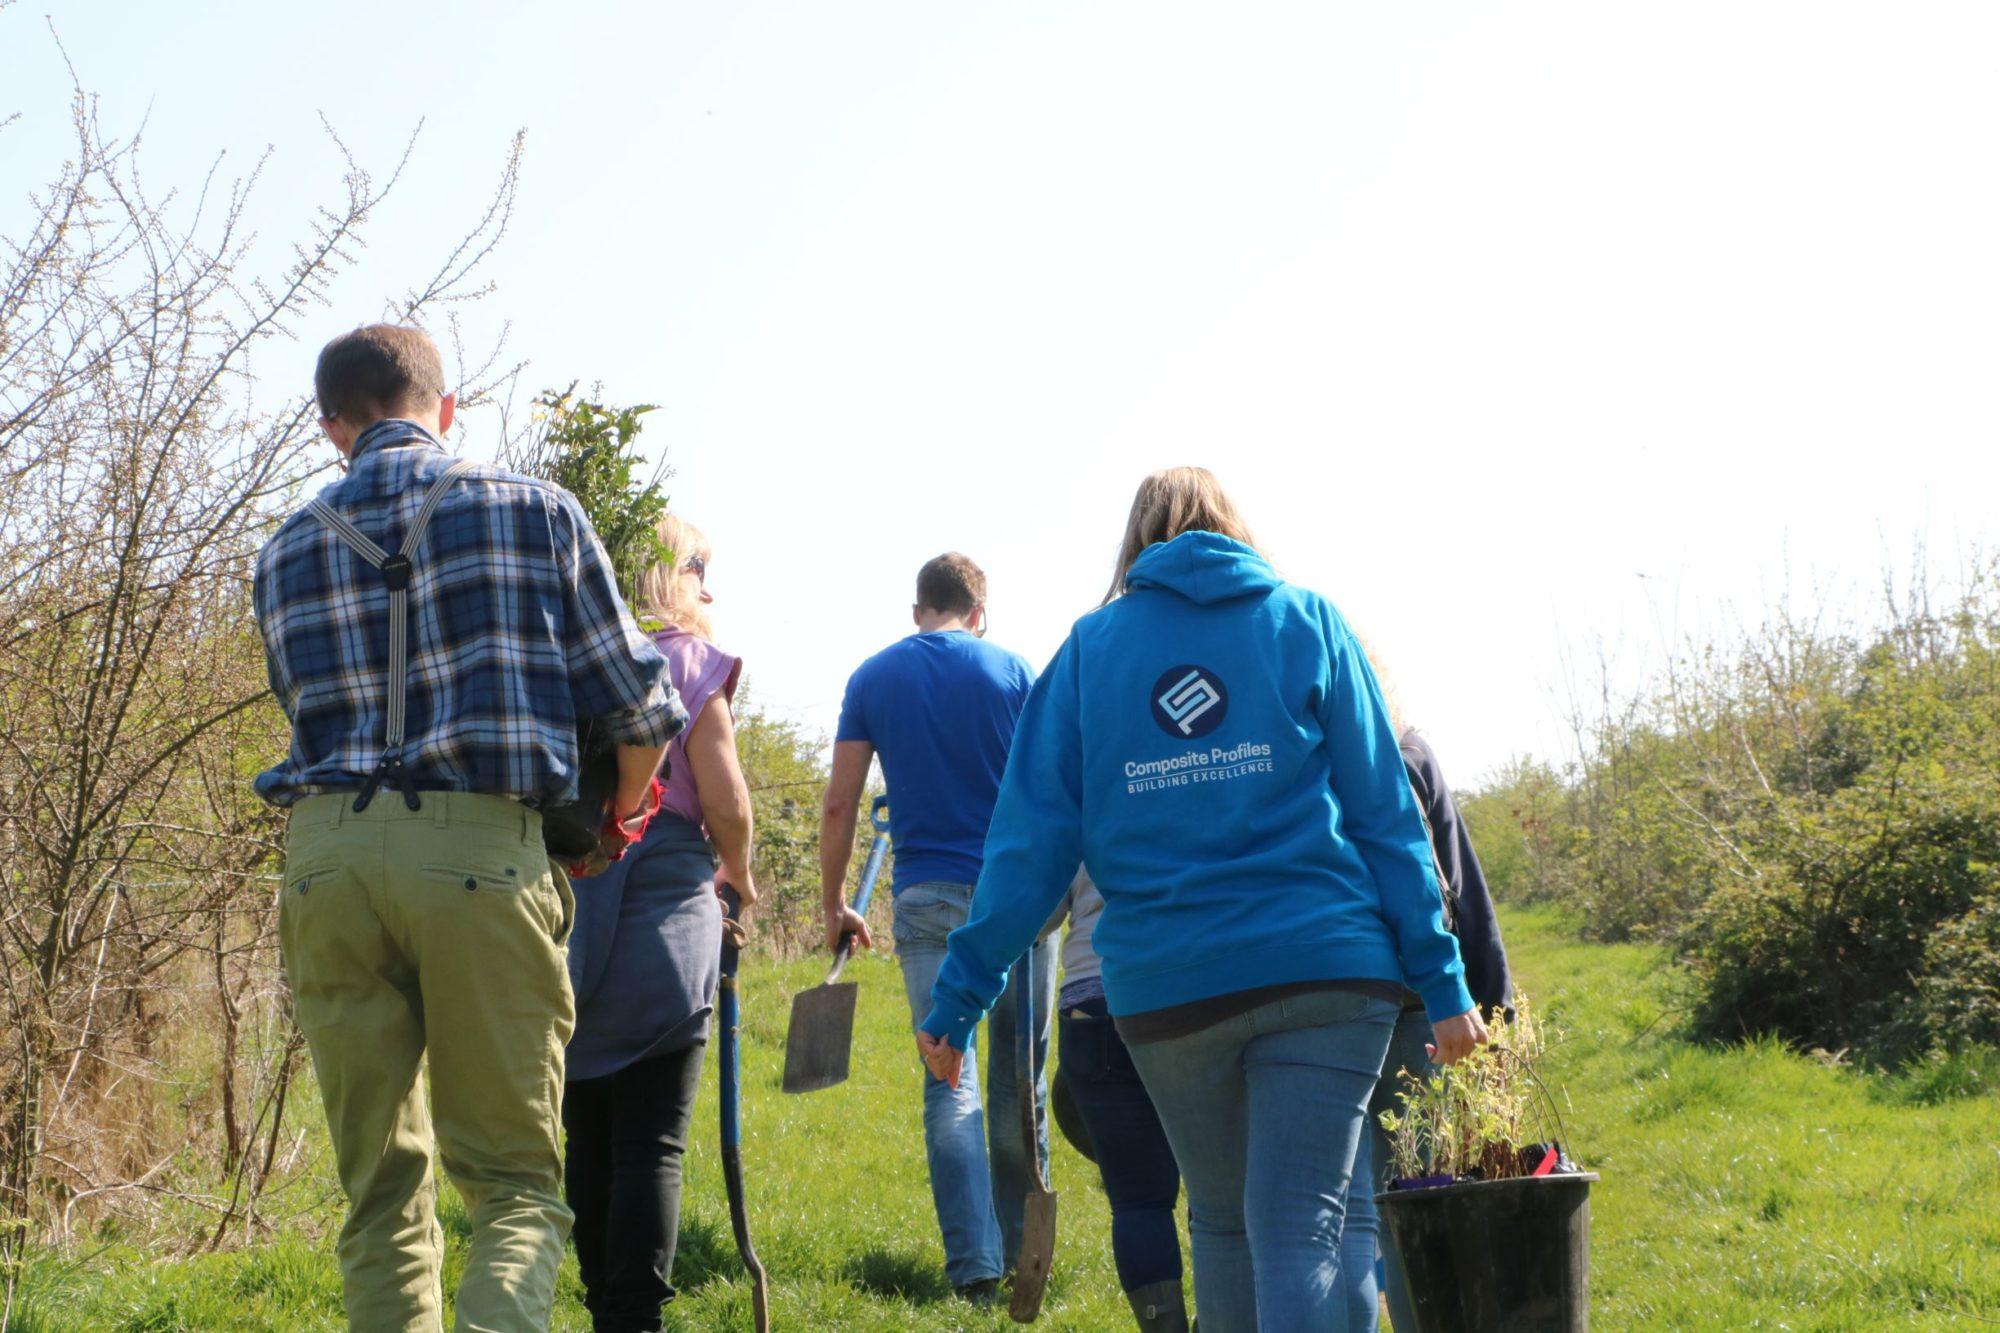 Composite Profiles team volunteering at Dorset Wildlife Trust supporting Mental Health Wellbeing